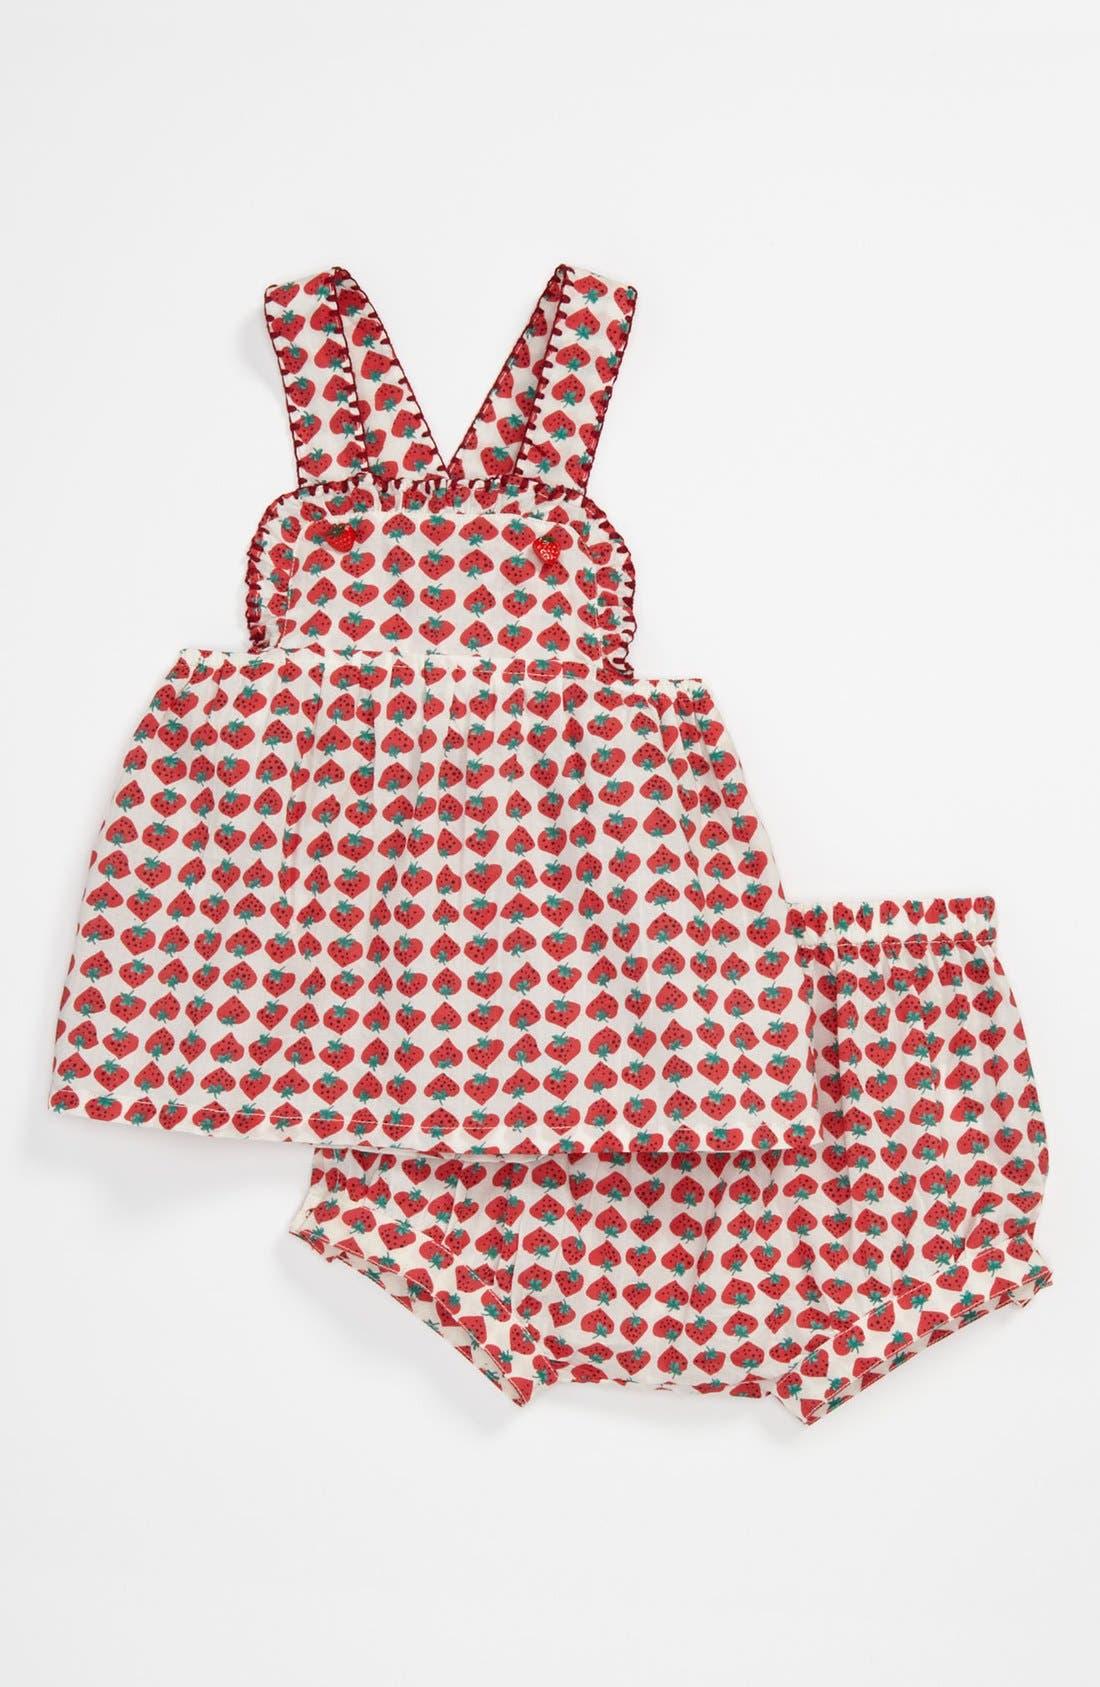 Main Image - Stella McCartney Kids 'Olivia' Dress & Bloomers (Baby)